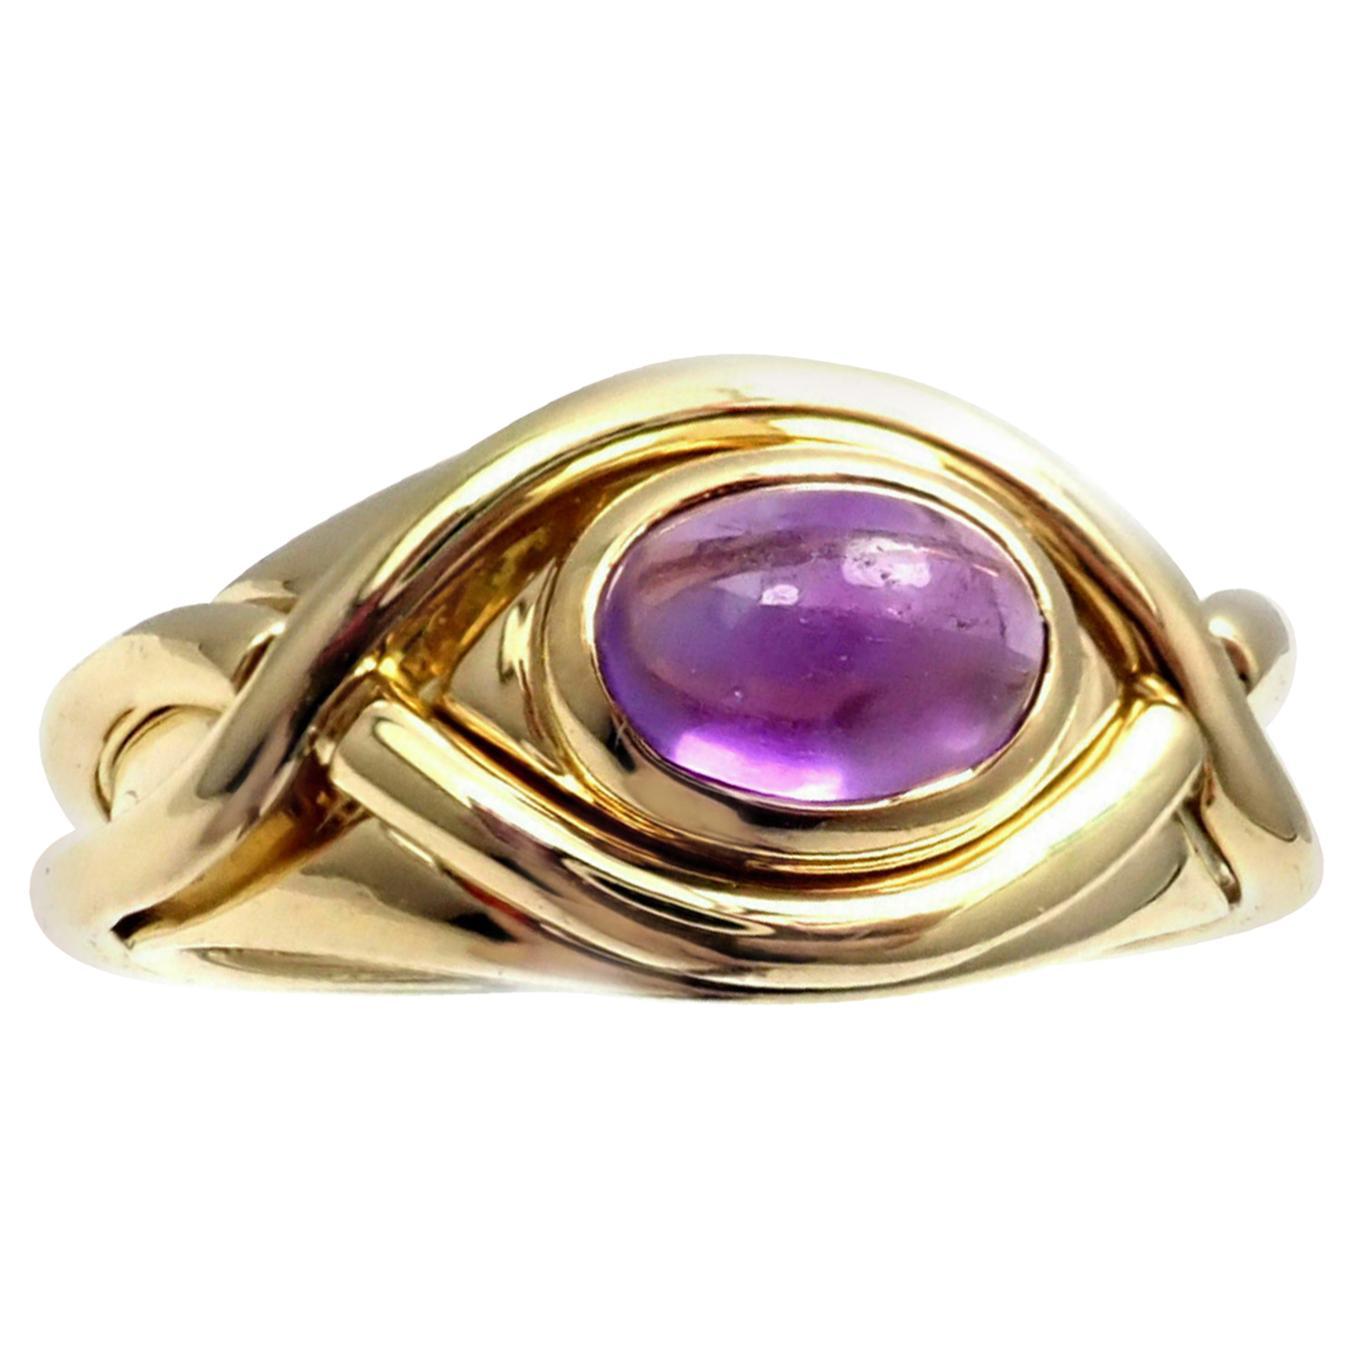 Tiffany & Co. Amethyst Twist Yellow Gold Band Ring